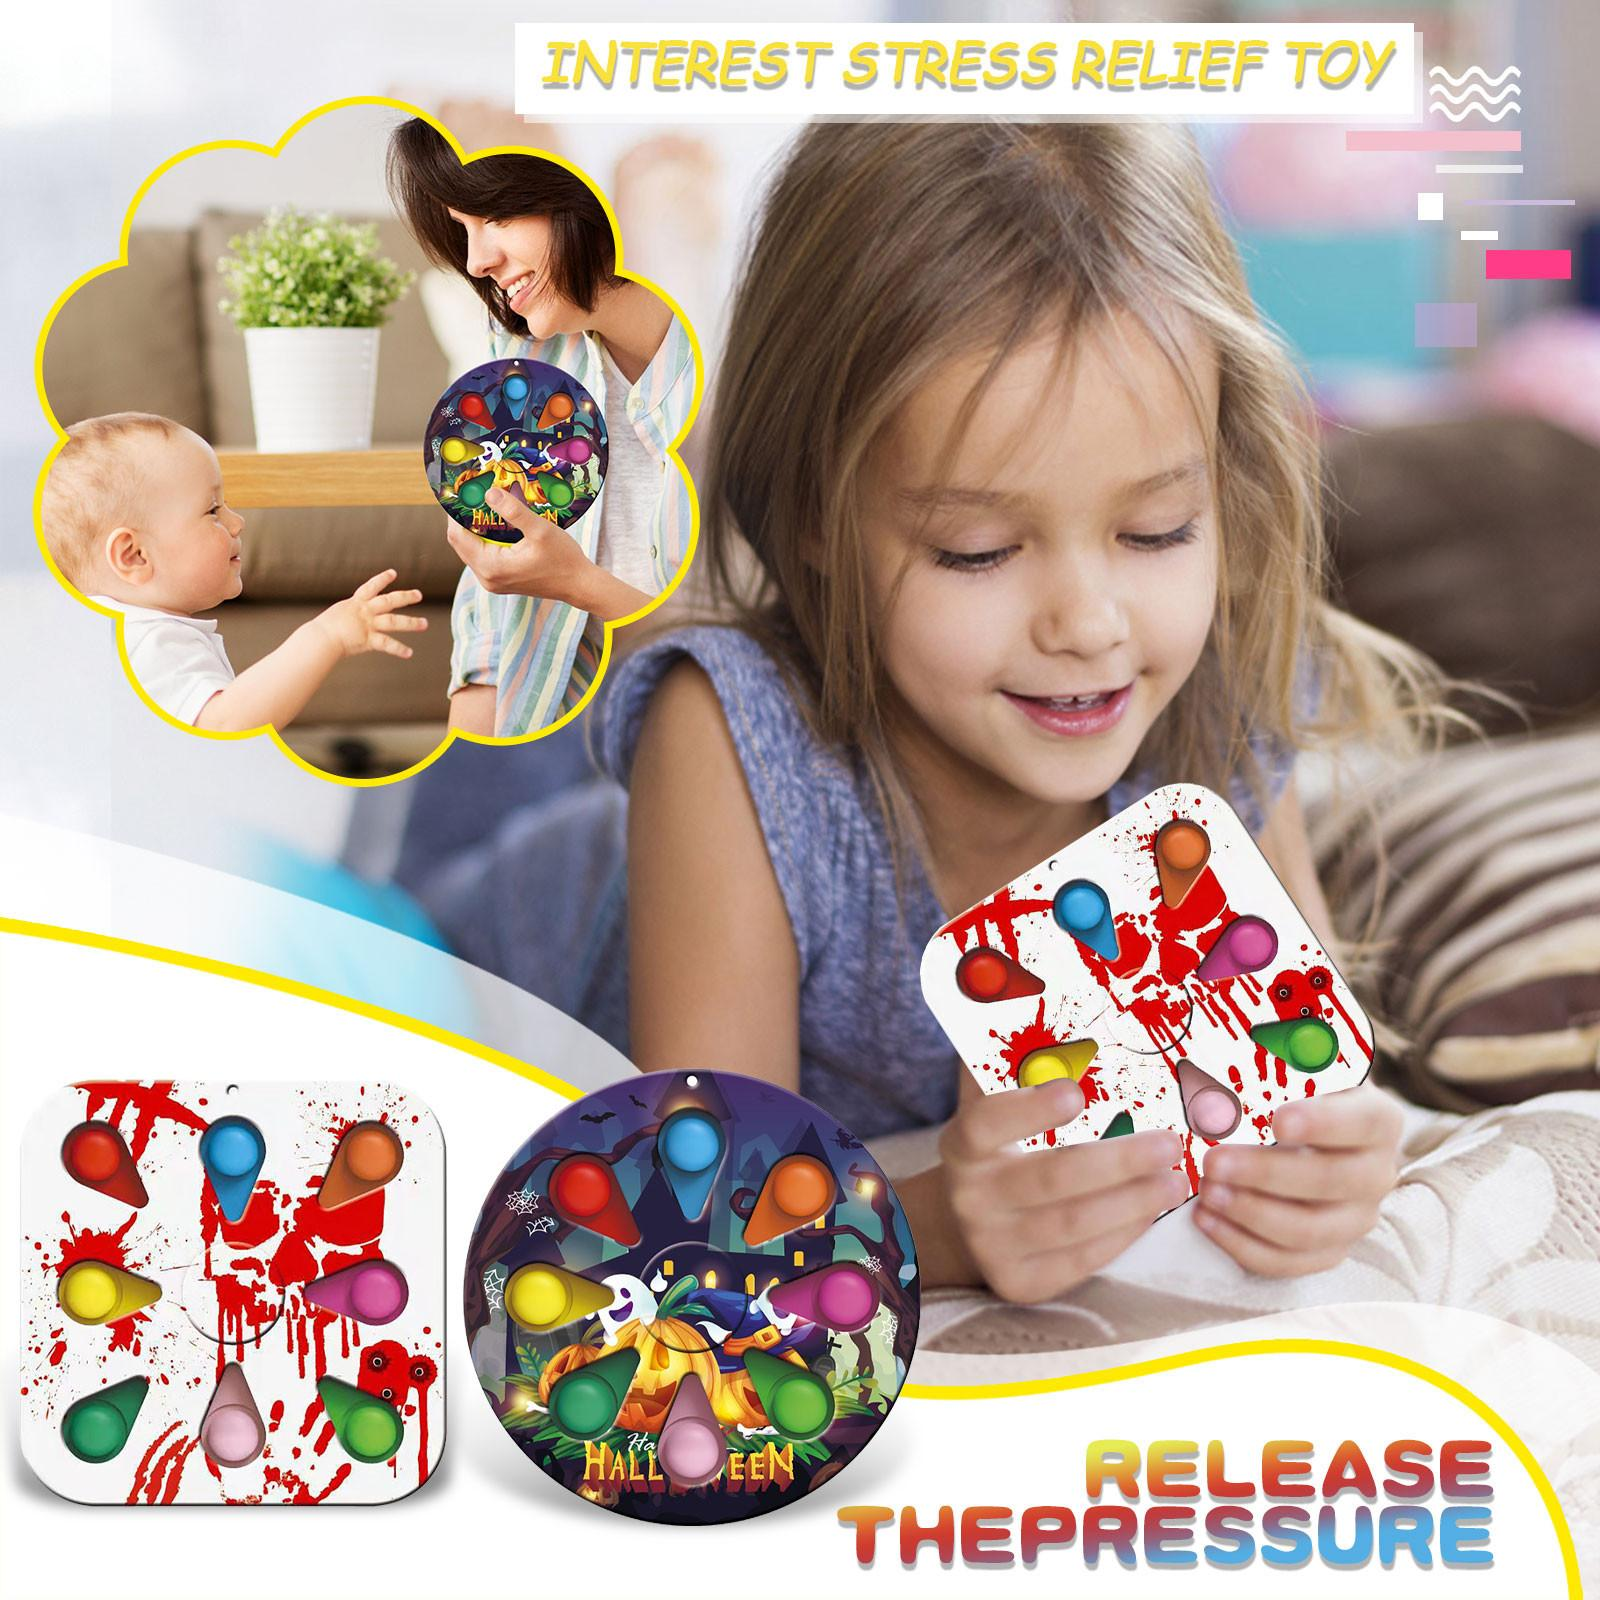 Nueva punta de dedo de Halloween Juego de descompresión Juguete Spinning Top Running Stress Relief Gyro Push Bubble Gifts Gifts